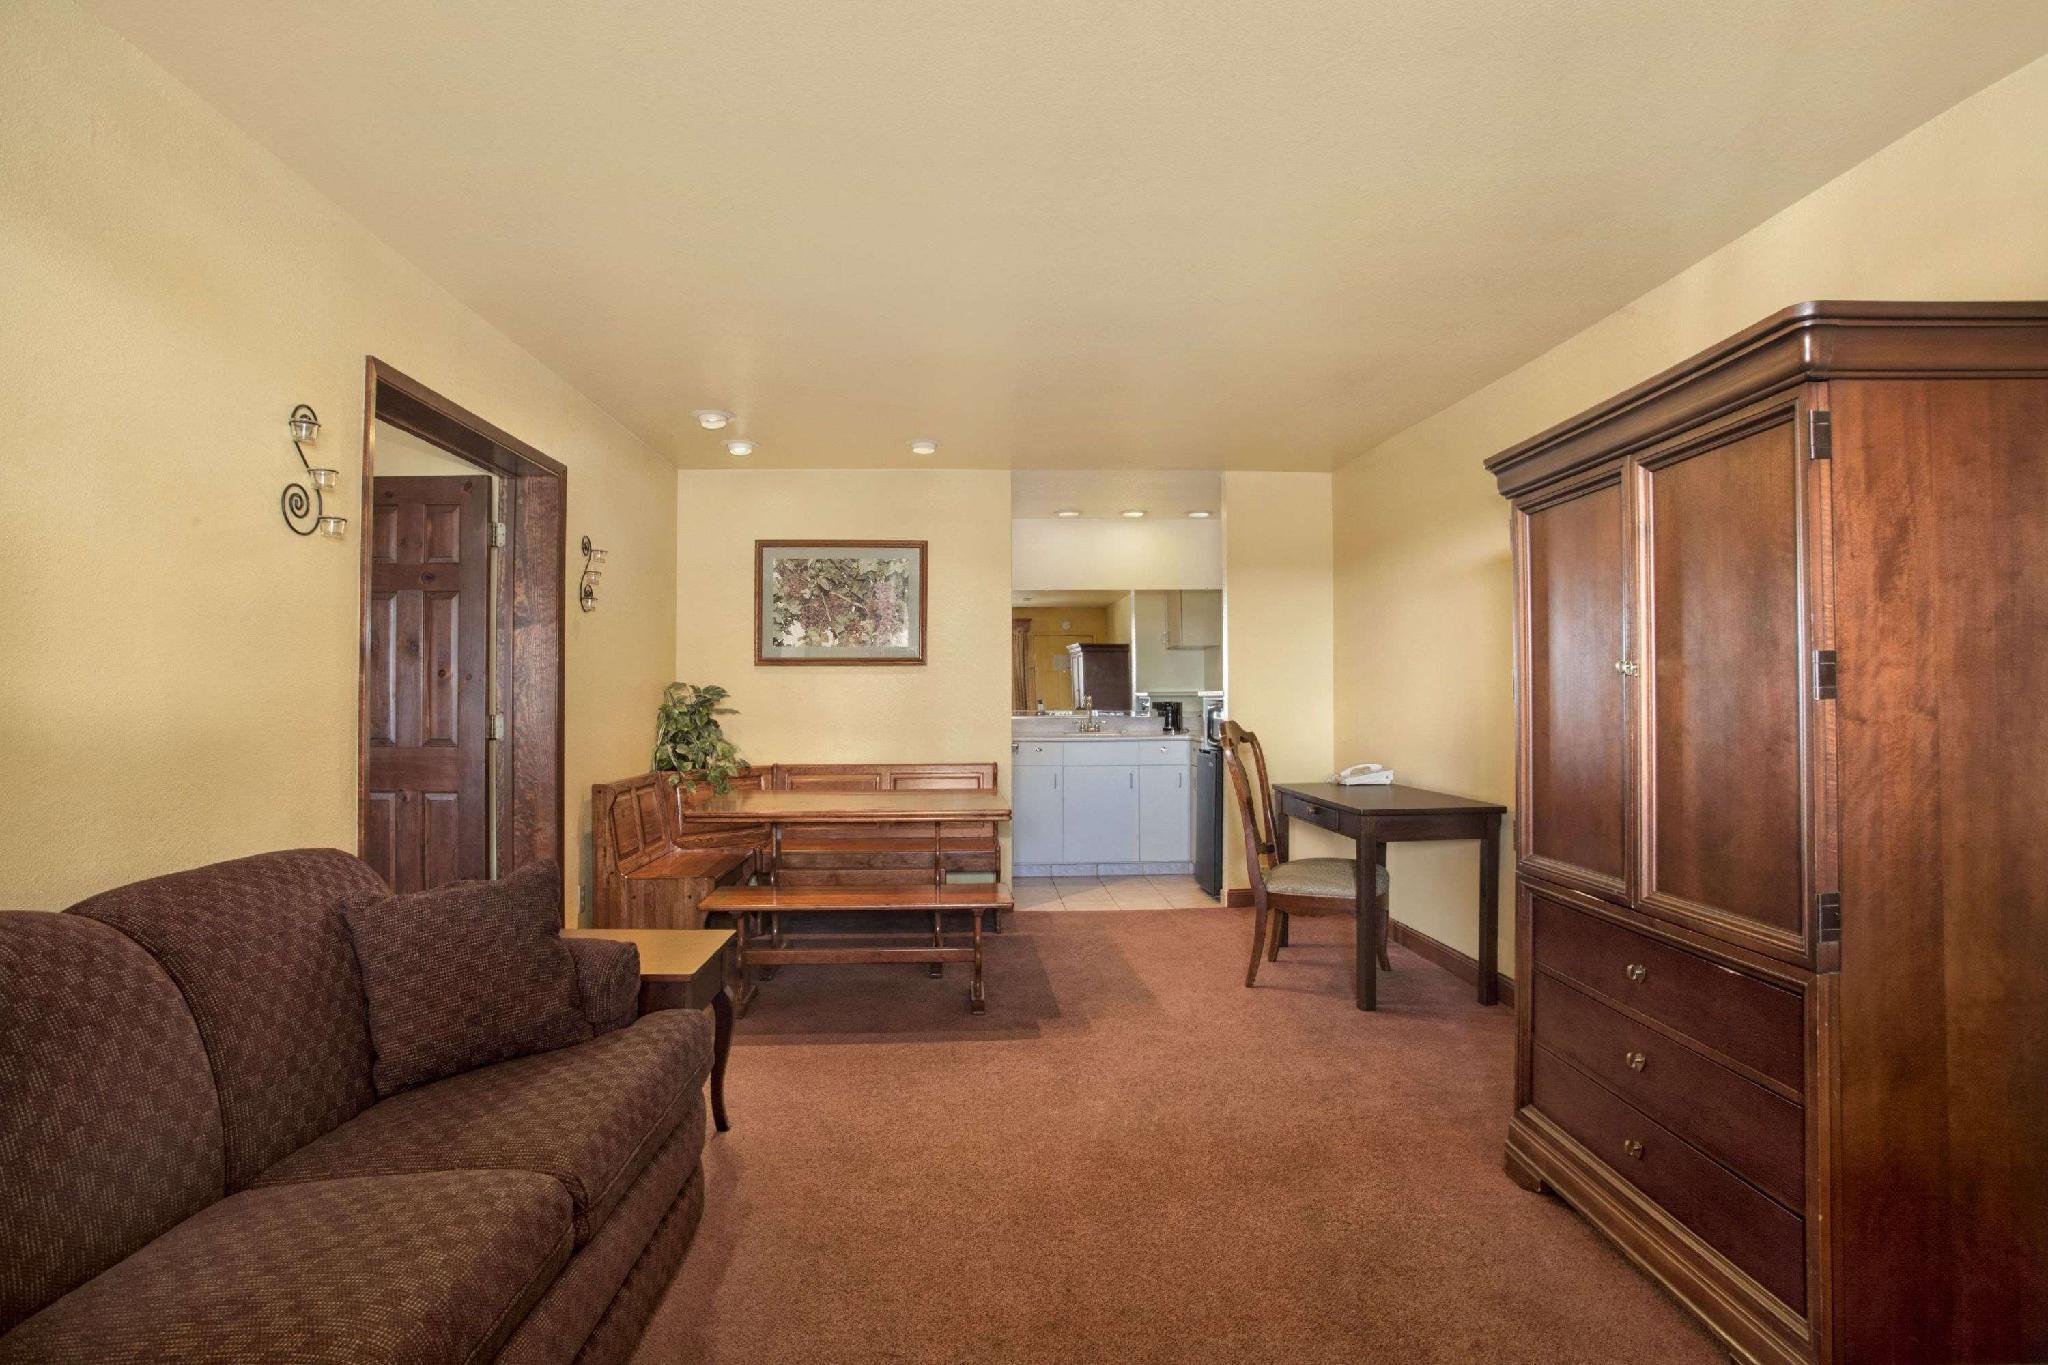 1 King Bed, Studio Suite, Non-Smoking